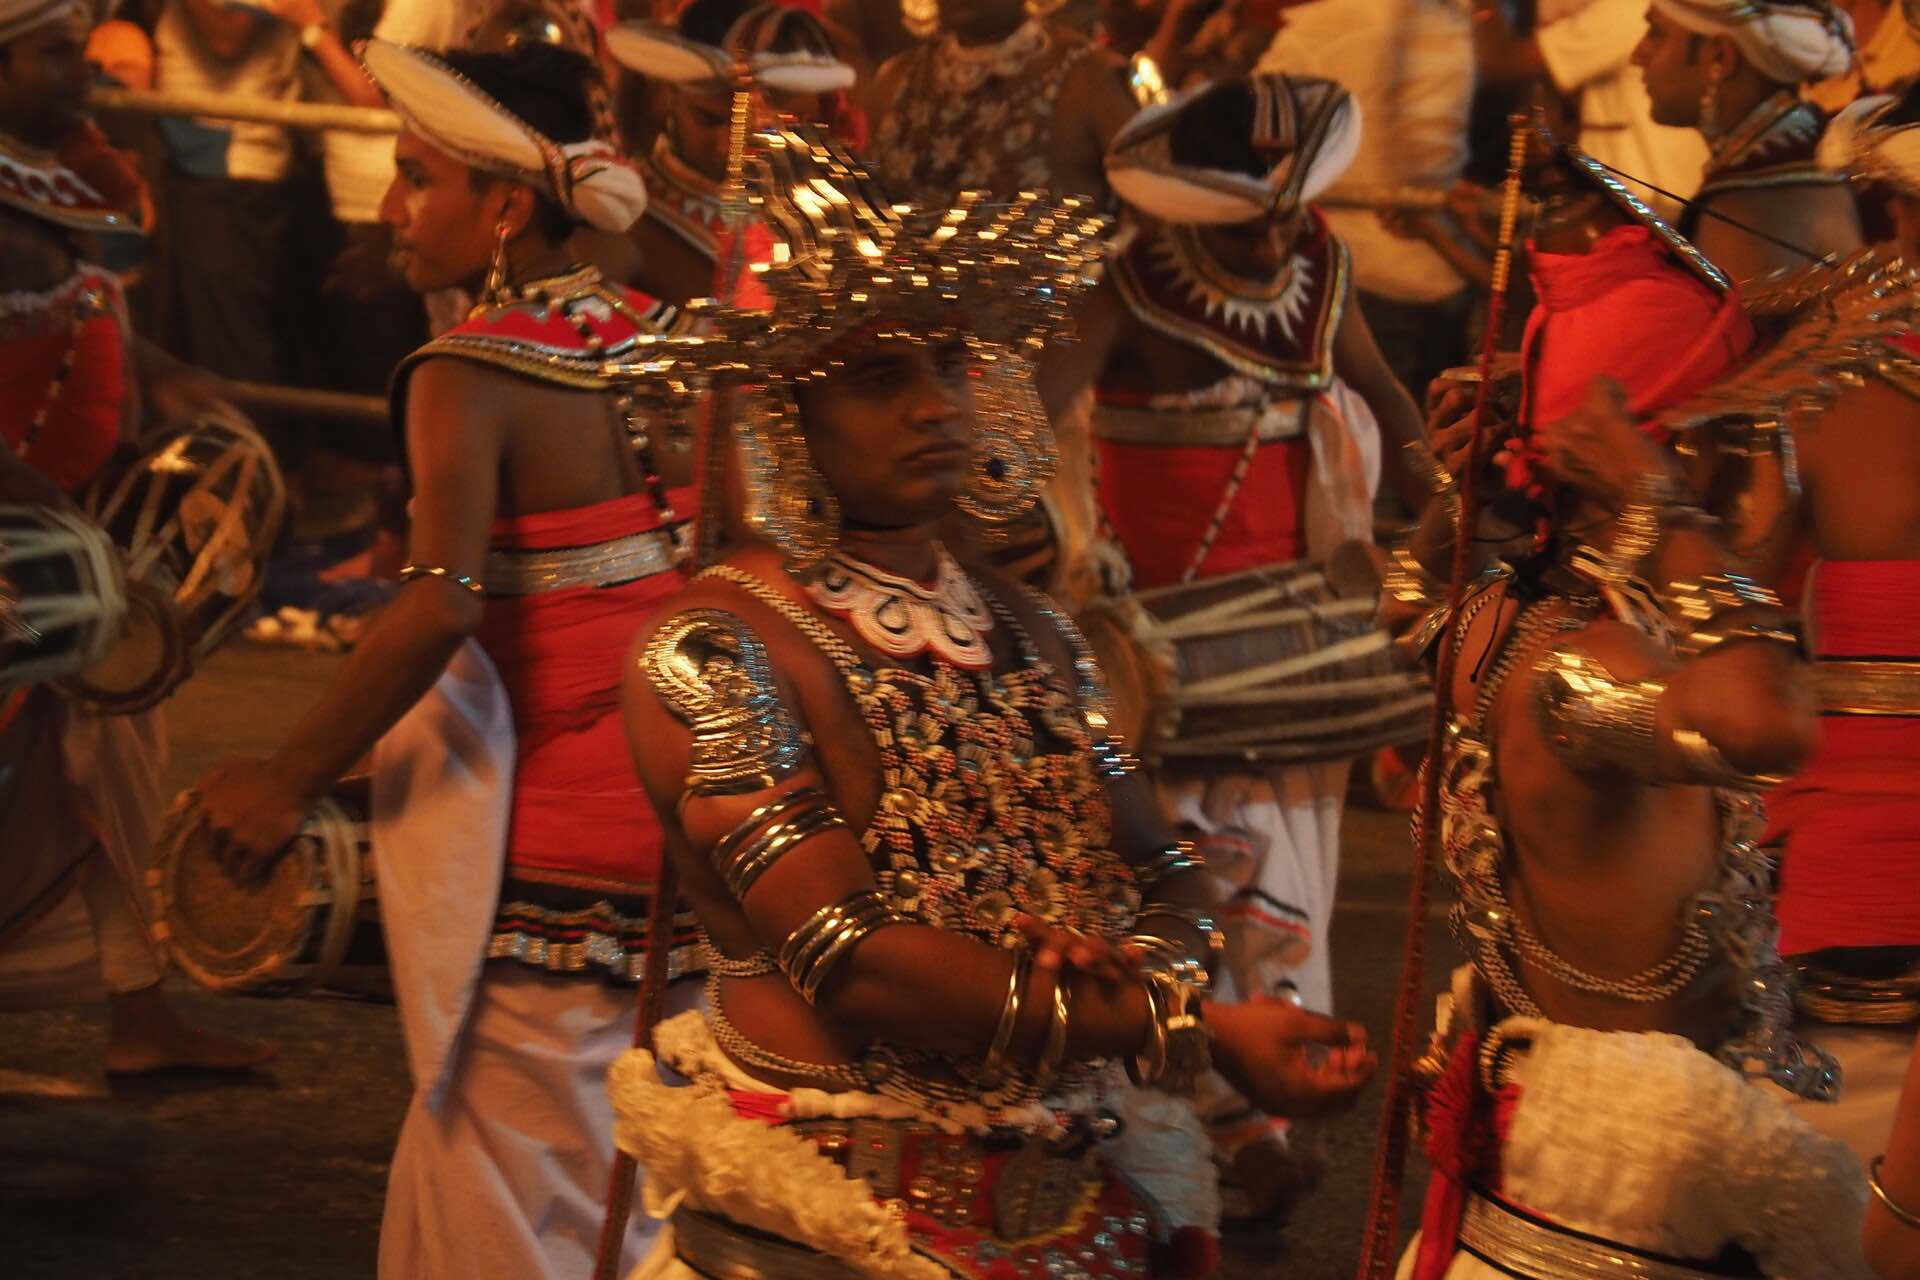 sri-lanka-kandy-perahera-dancers-holiday-review-feedback-invite-to-paradise-quentin-kate-hulm.jpg